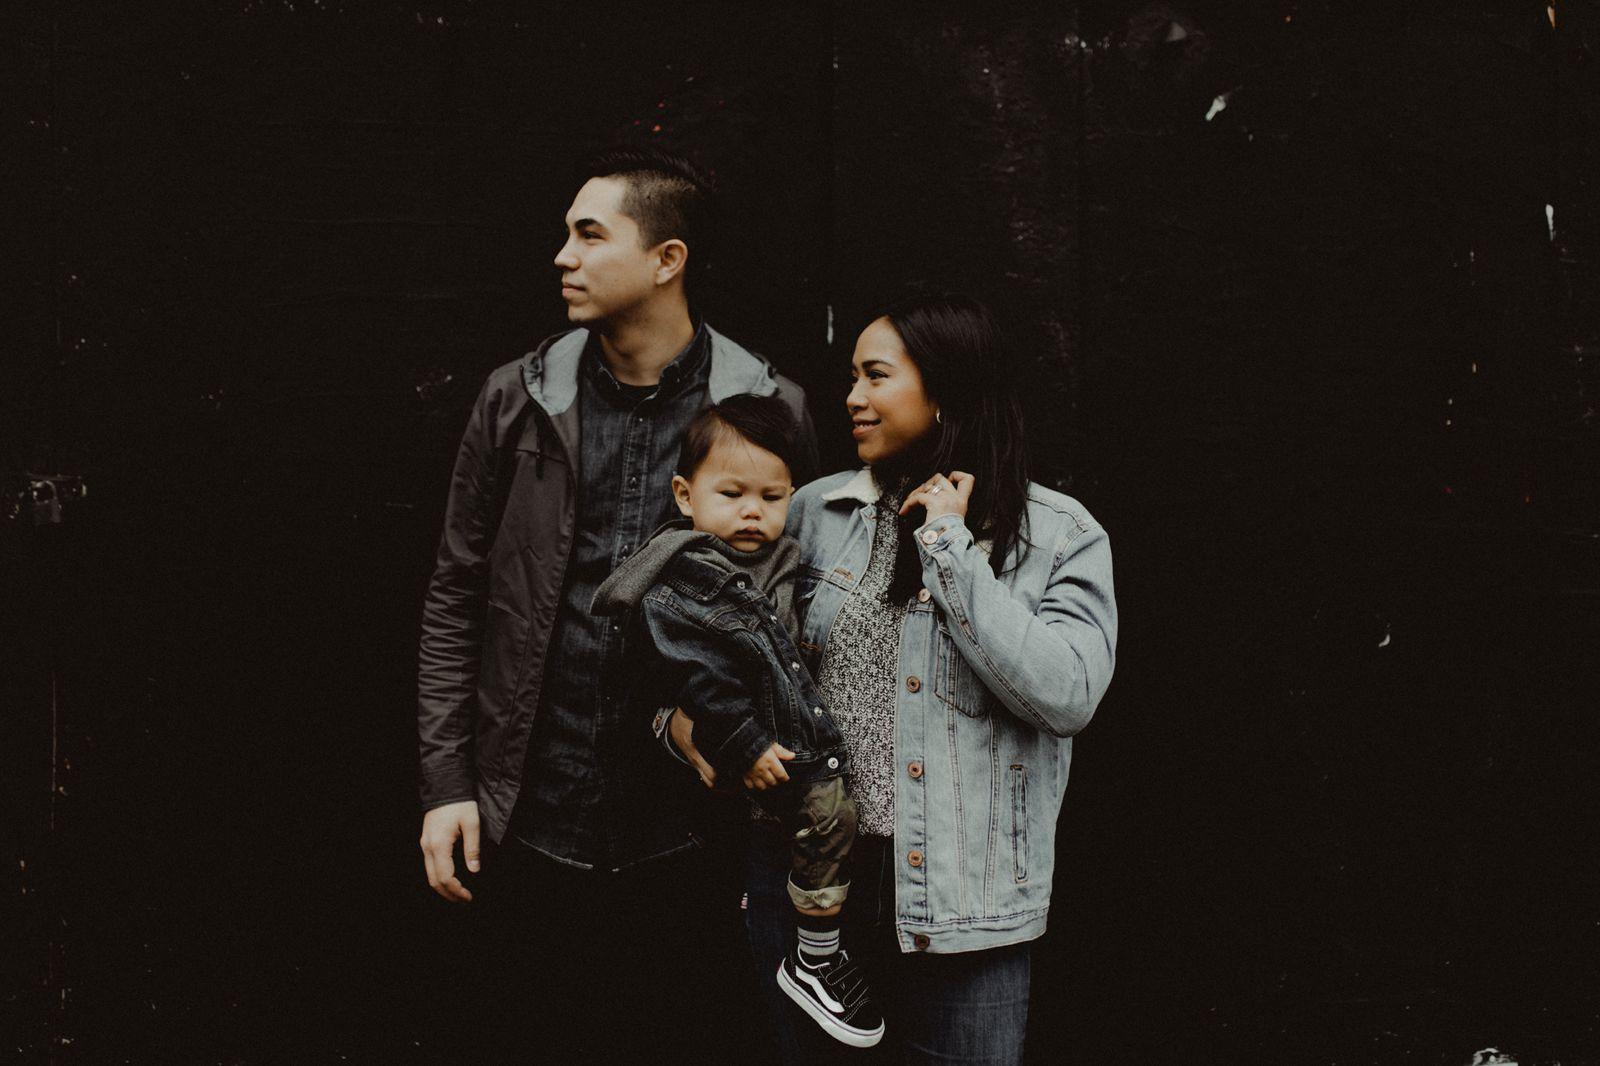 Malorie-Kerouac-Portland-Family-Photorapher-0207_websize.jpg